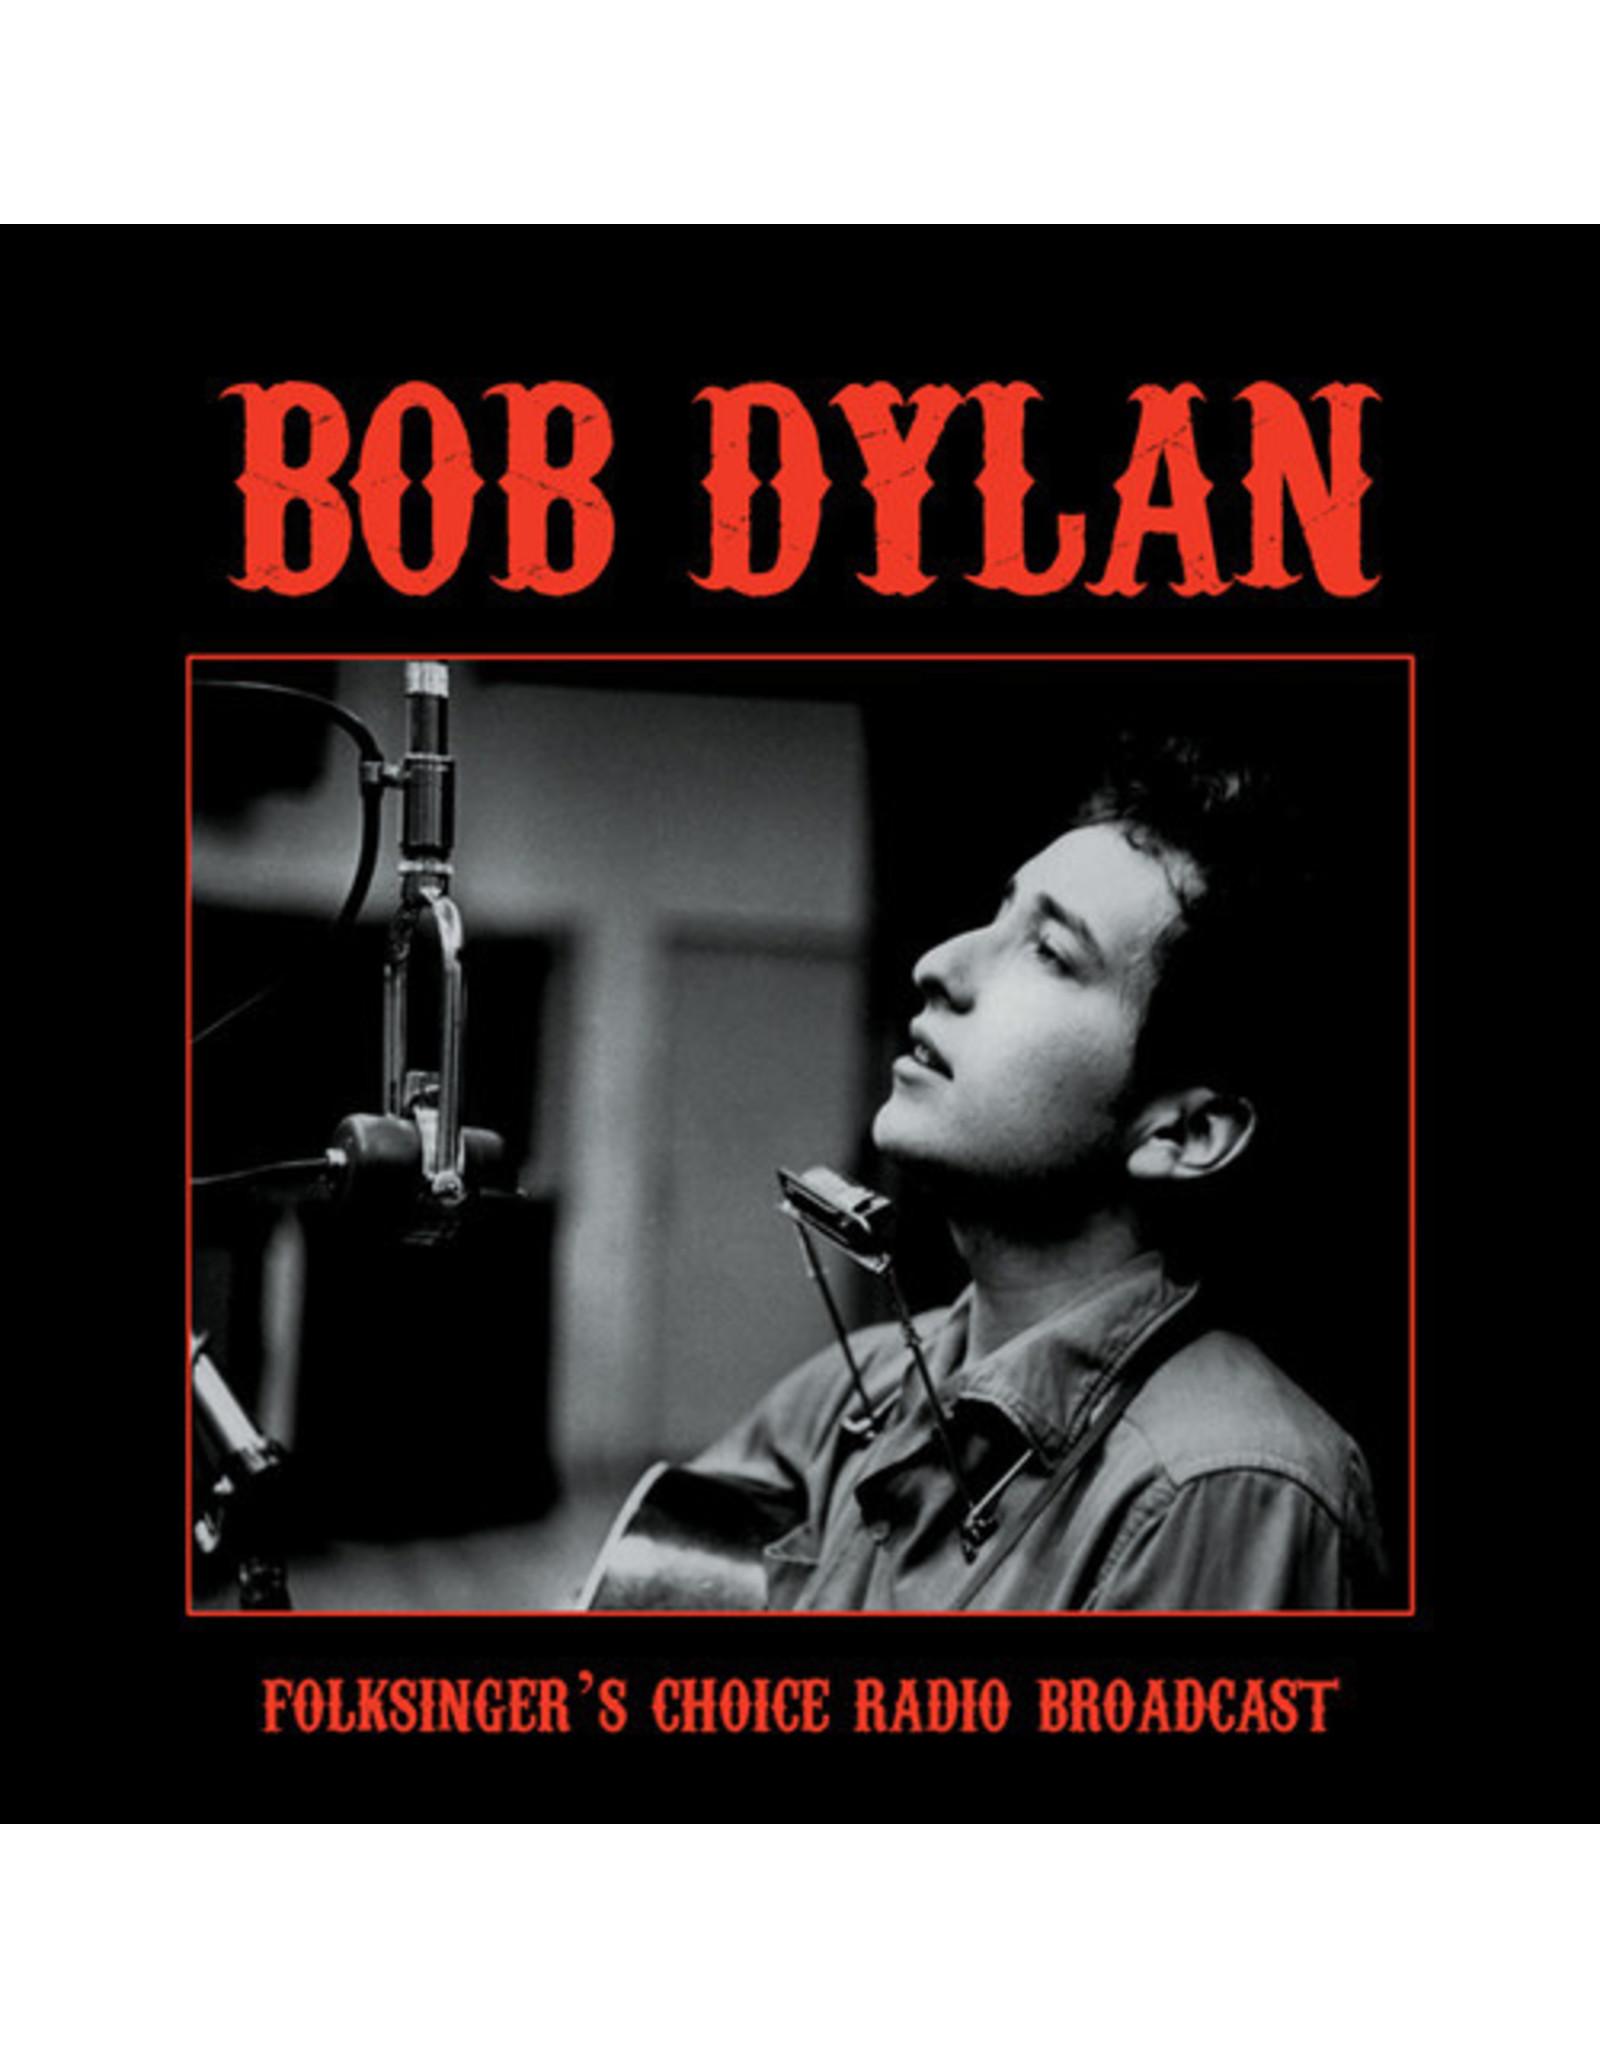 New Vinyl Bob Dylan - Folksinger's Choice Radio Broadcast LP